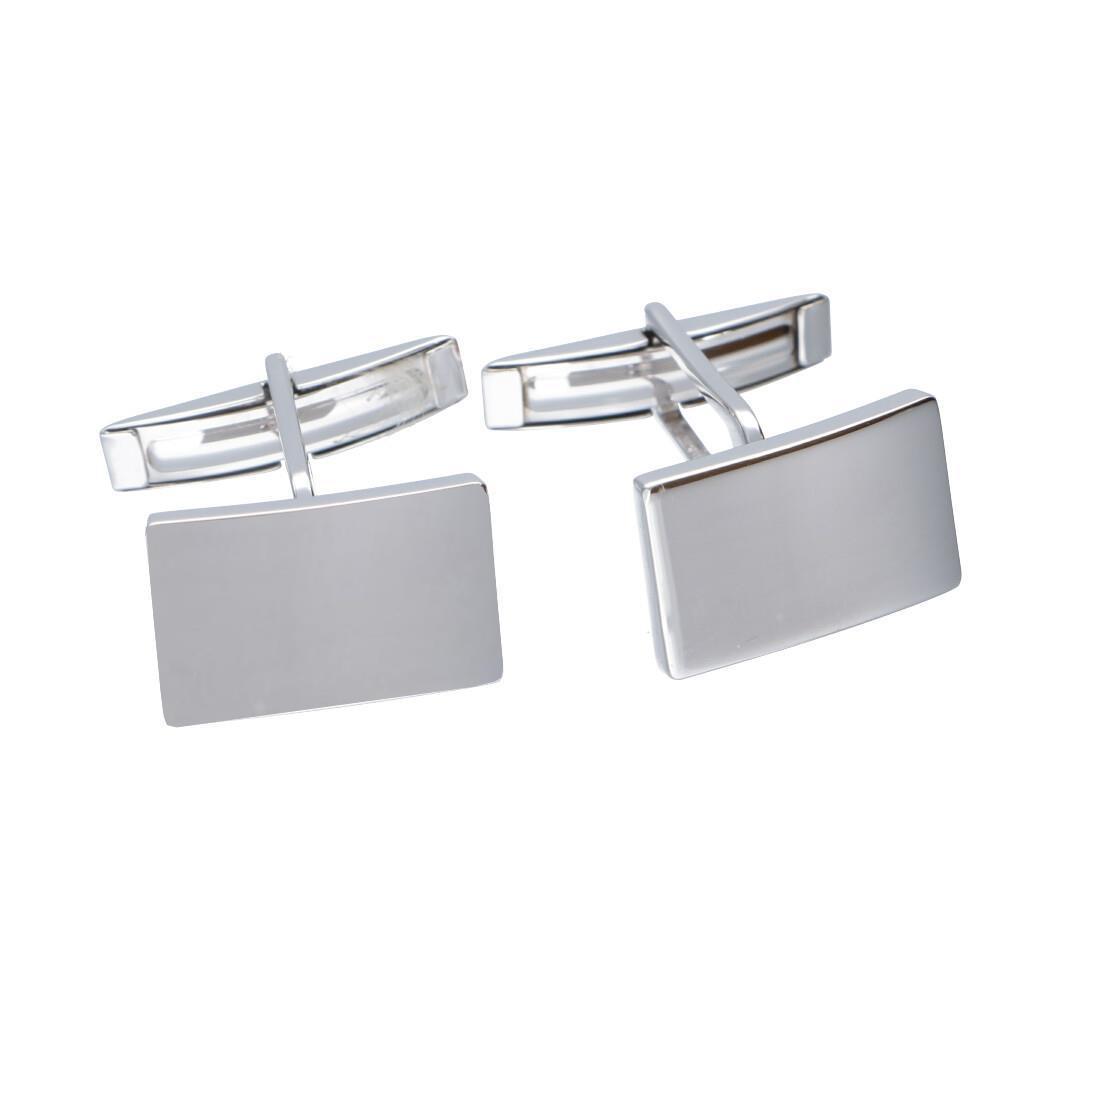 Gemelli in argento - ORO&CO 925